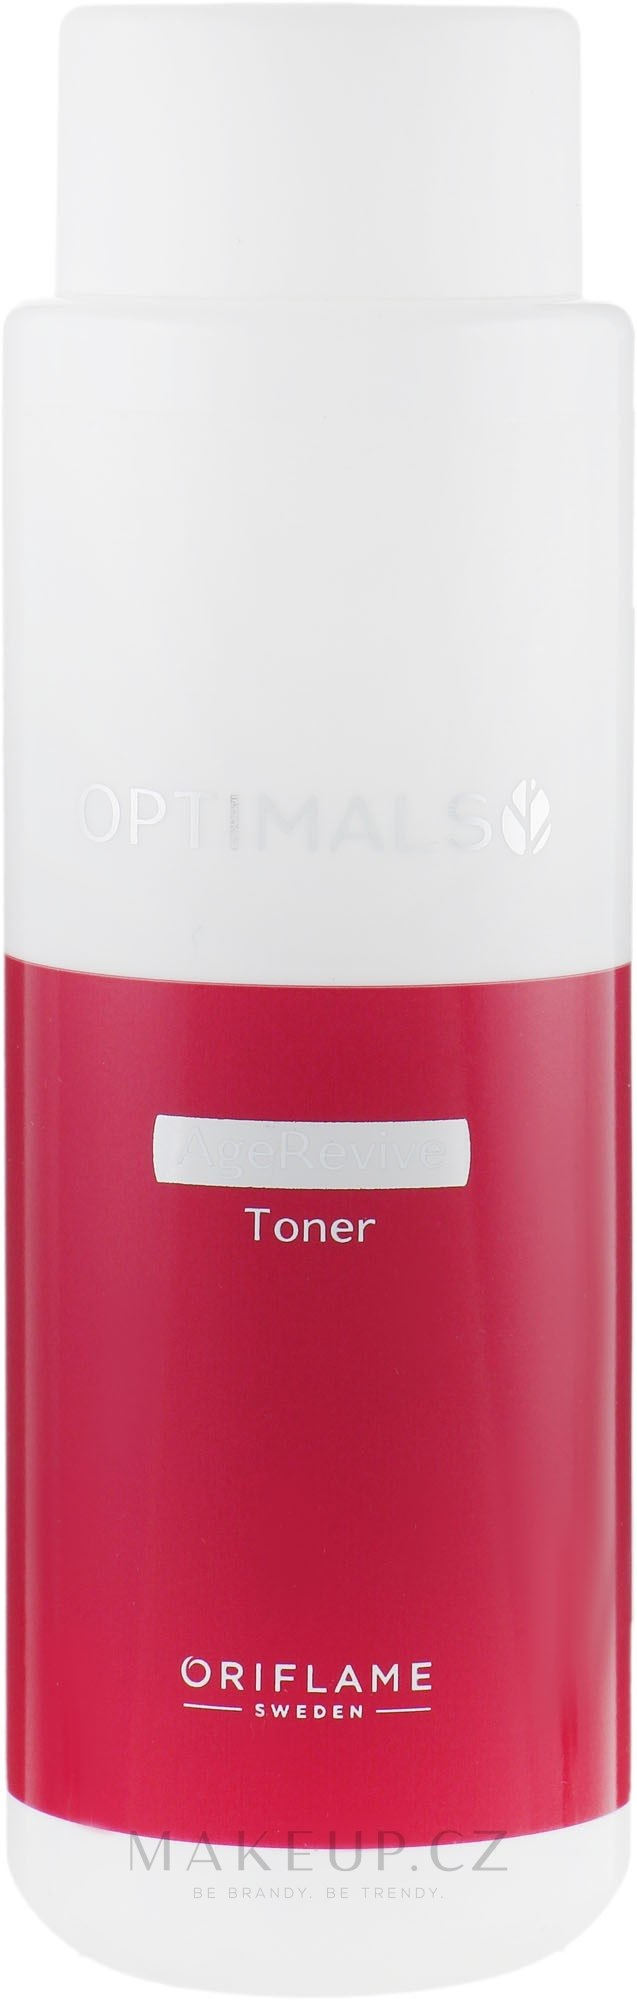 Pleťové tonikum proti stárnutí - Oriflame Optimals Age Revive Toner — foto 150 ml